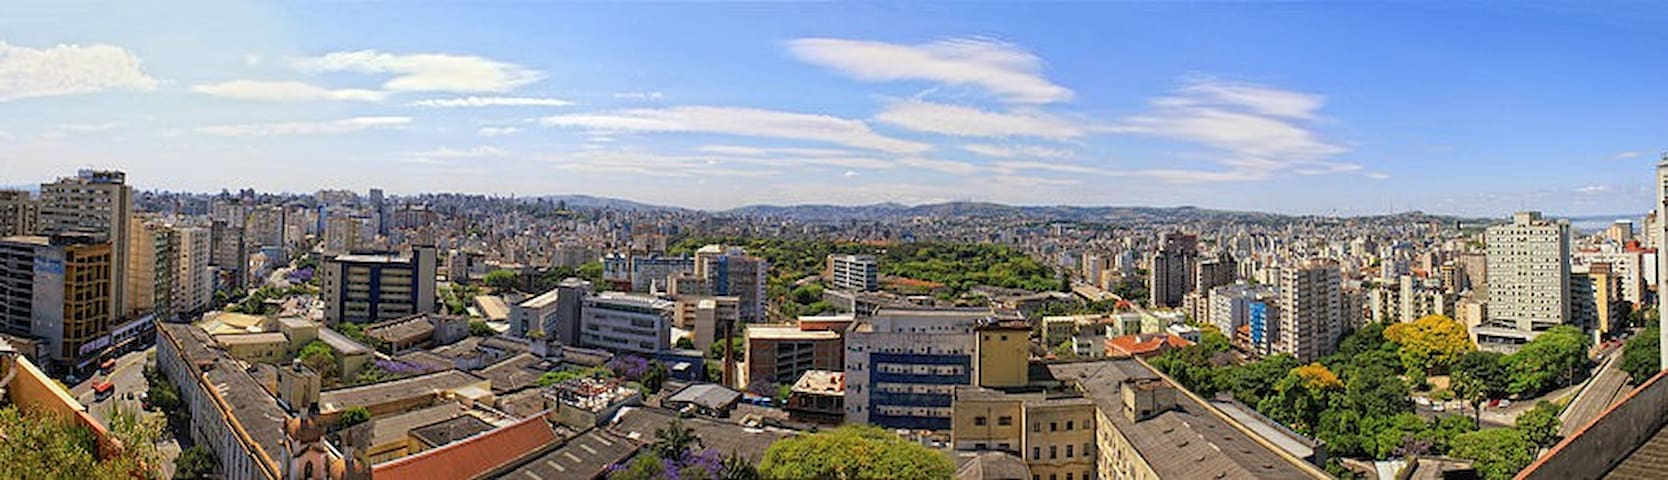 Aconchego Porto Alegrense - Porto Alegre - House